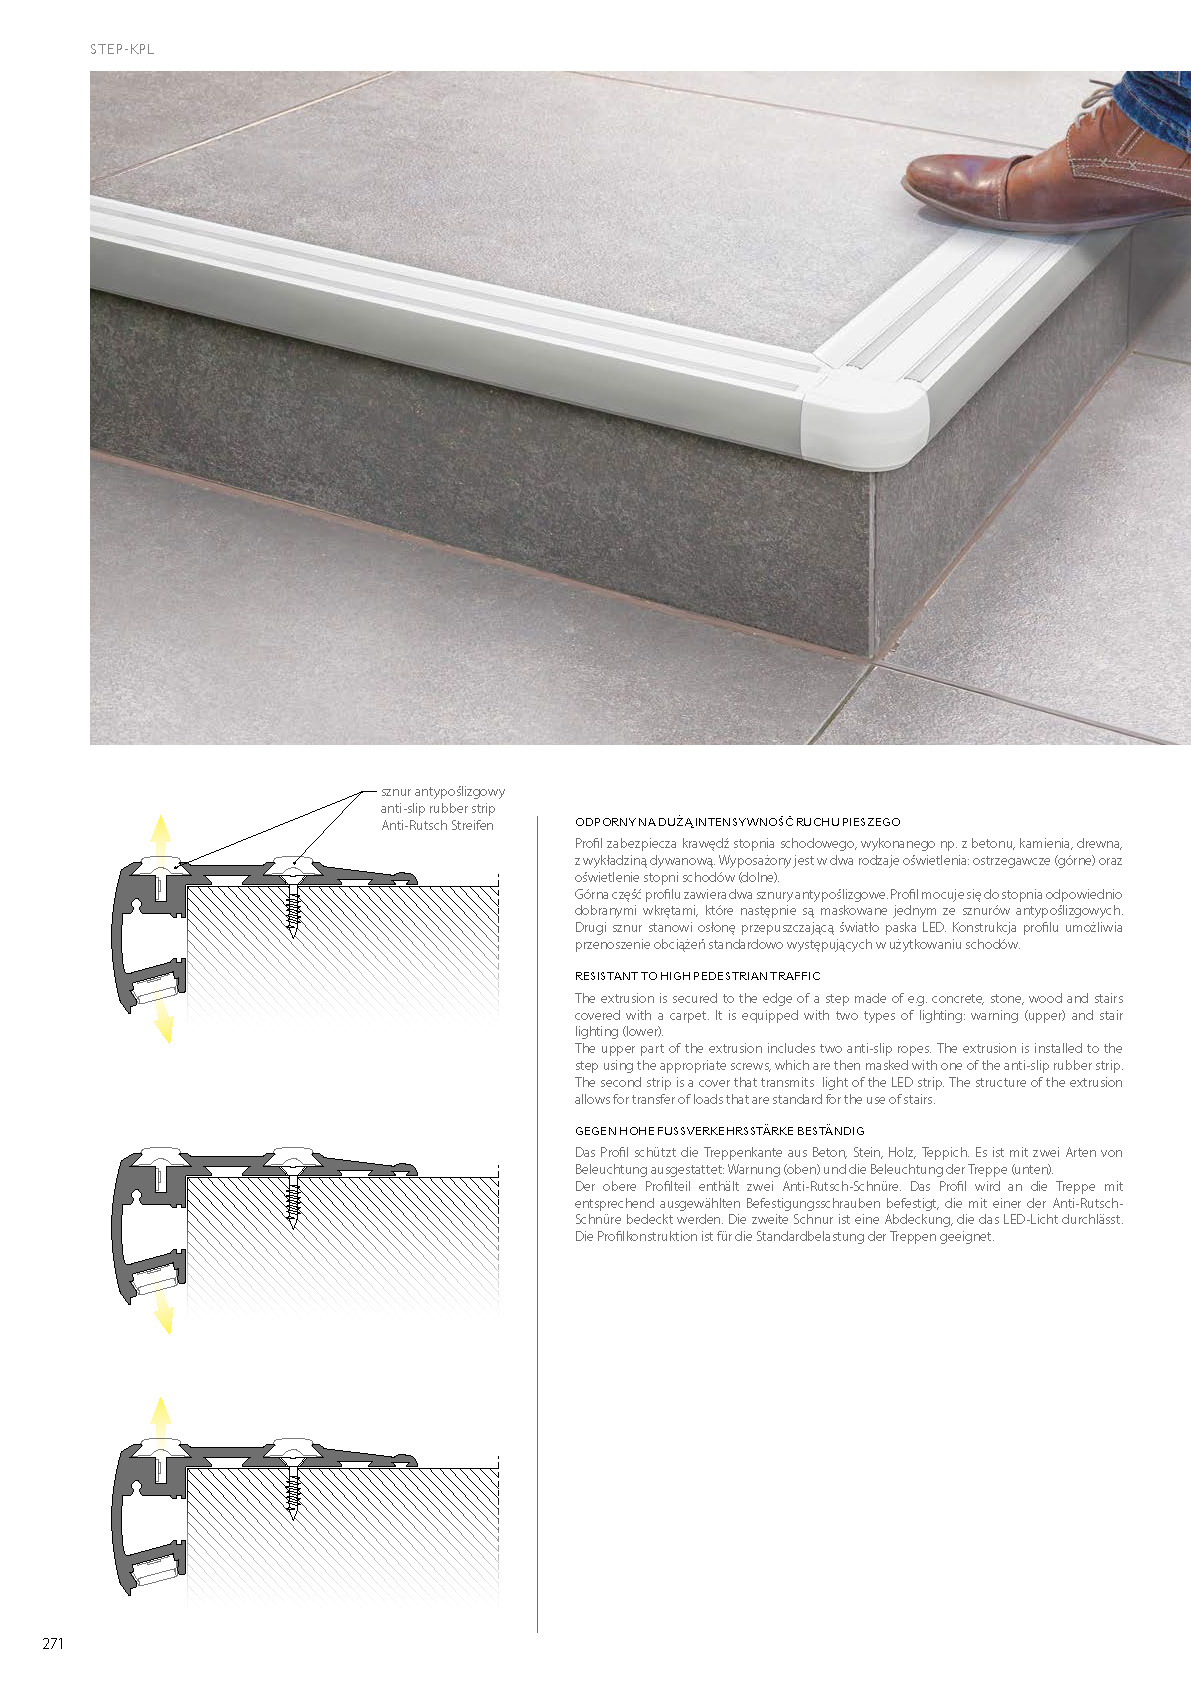 Profil LED STEP | Shop Treppenbeleuchtung.info